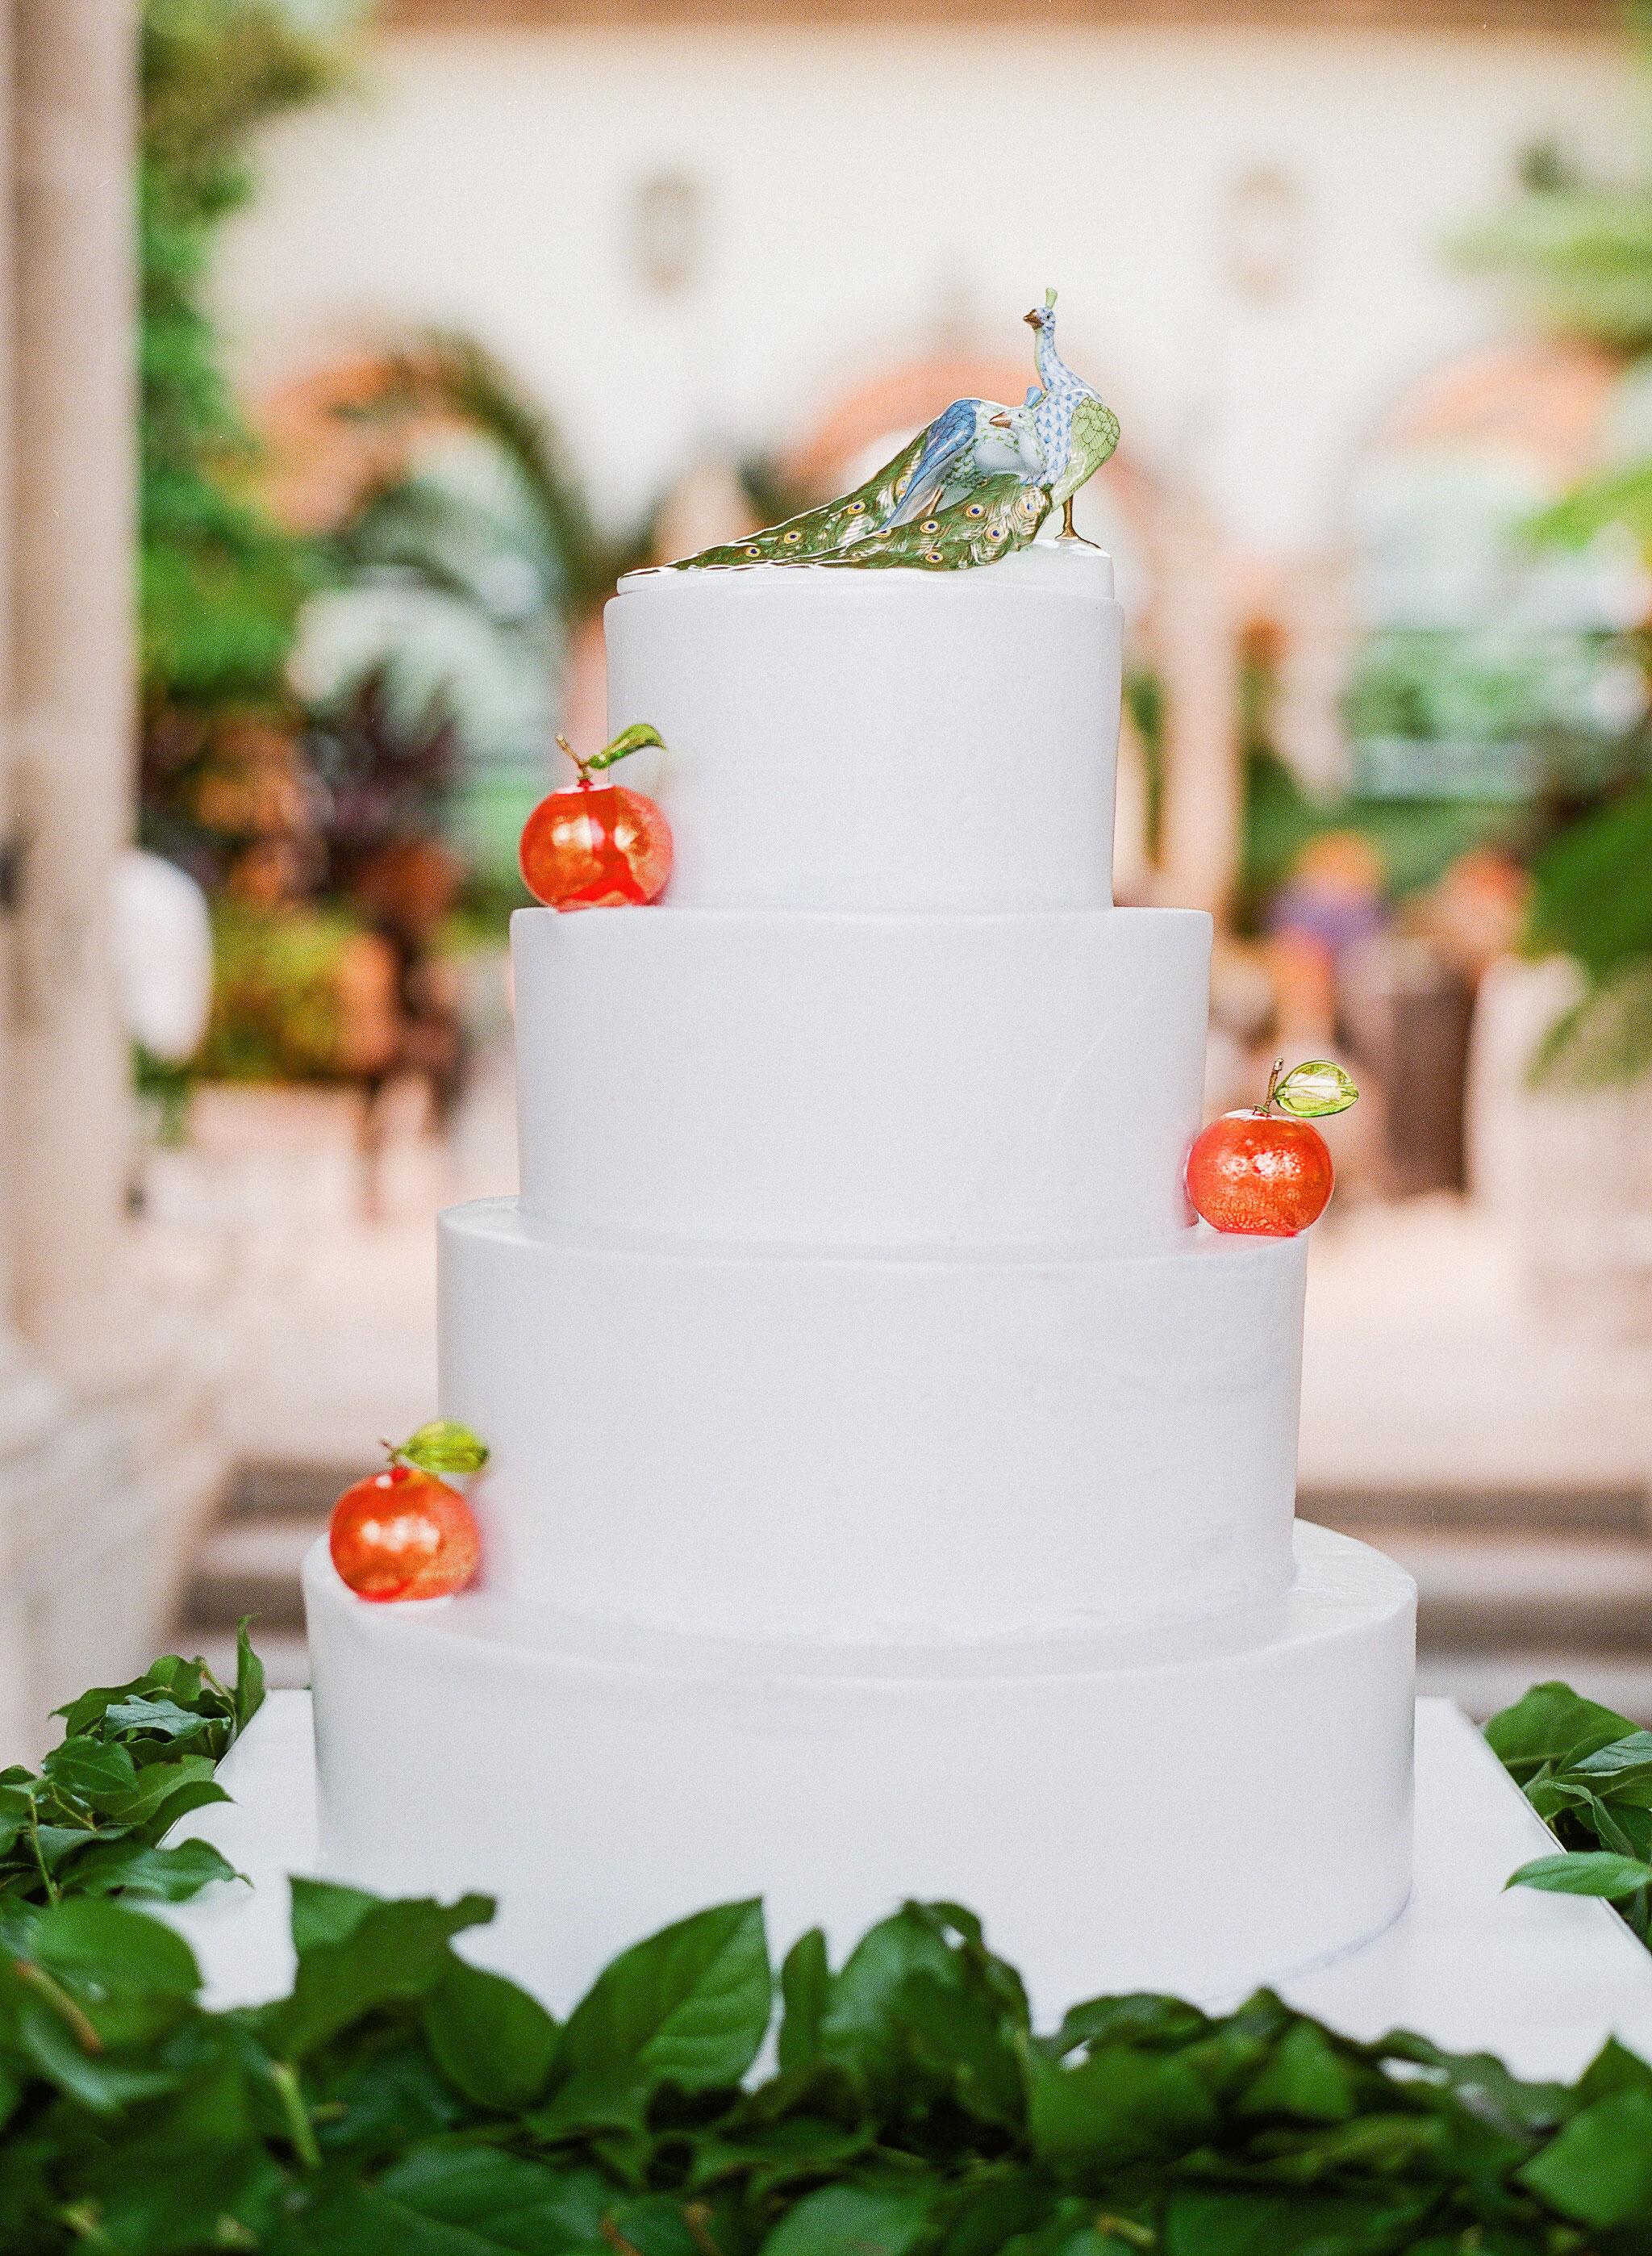 natalie jamey wedding cake